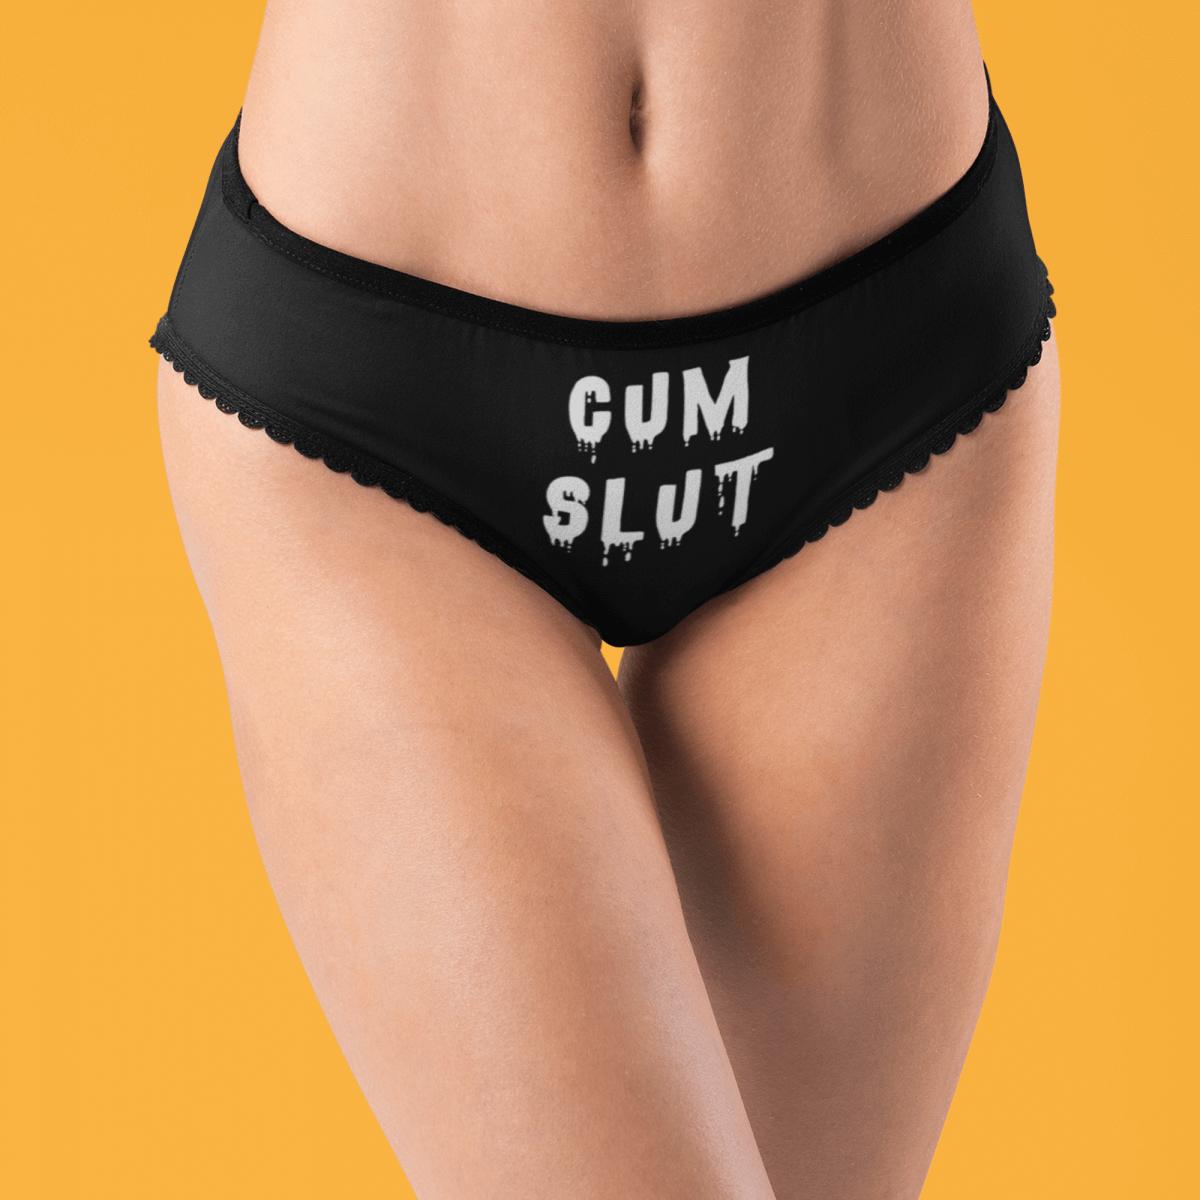 Cum-Slut-Panties-Filthy-BDSM-Kinky-Panties-1